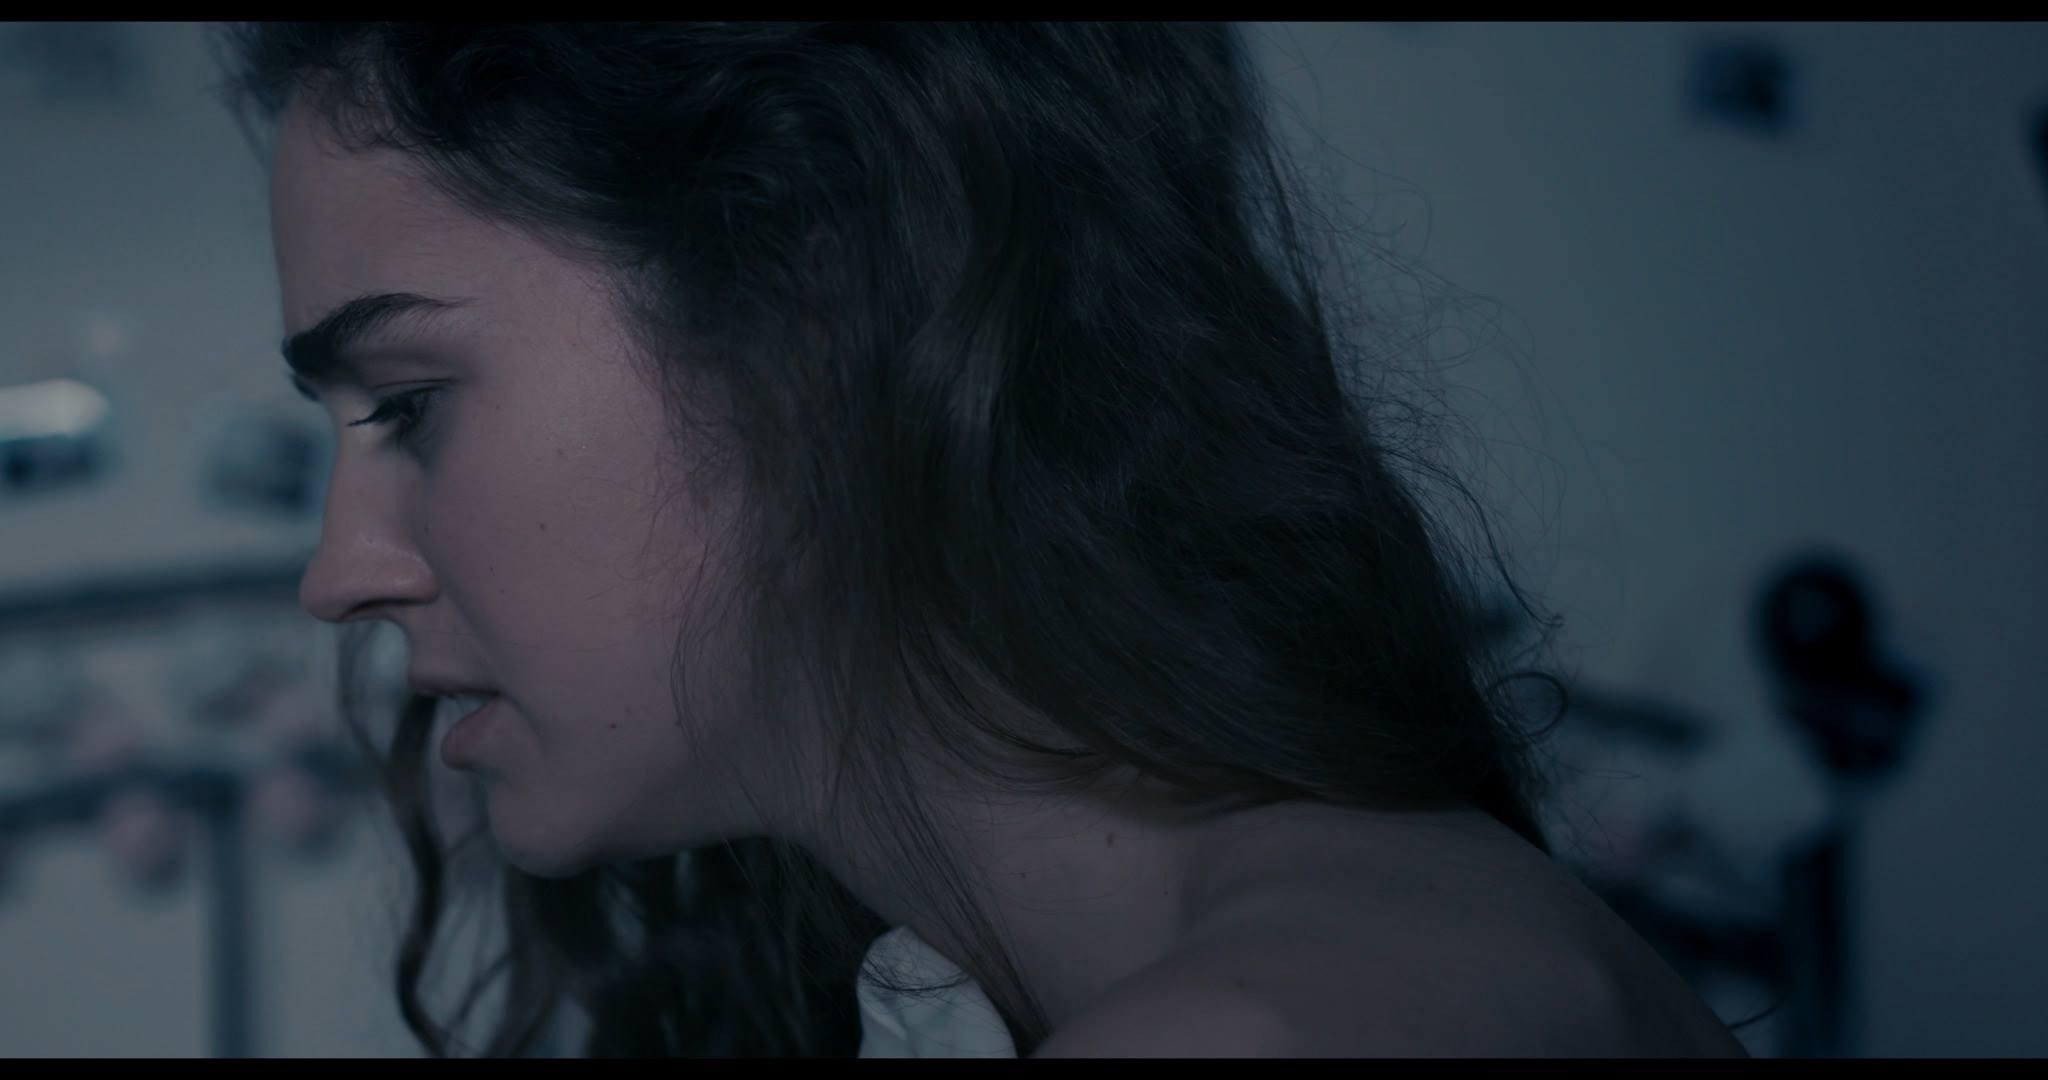 Spilt Milk - Lucy Chappell as Scarlett.